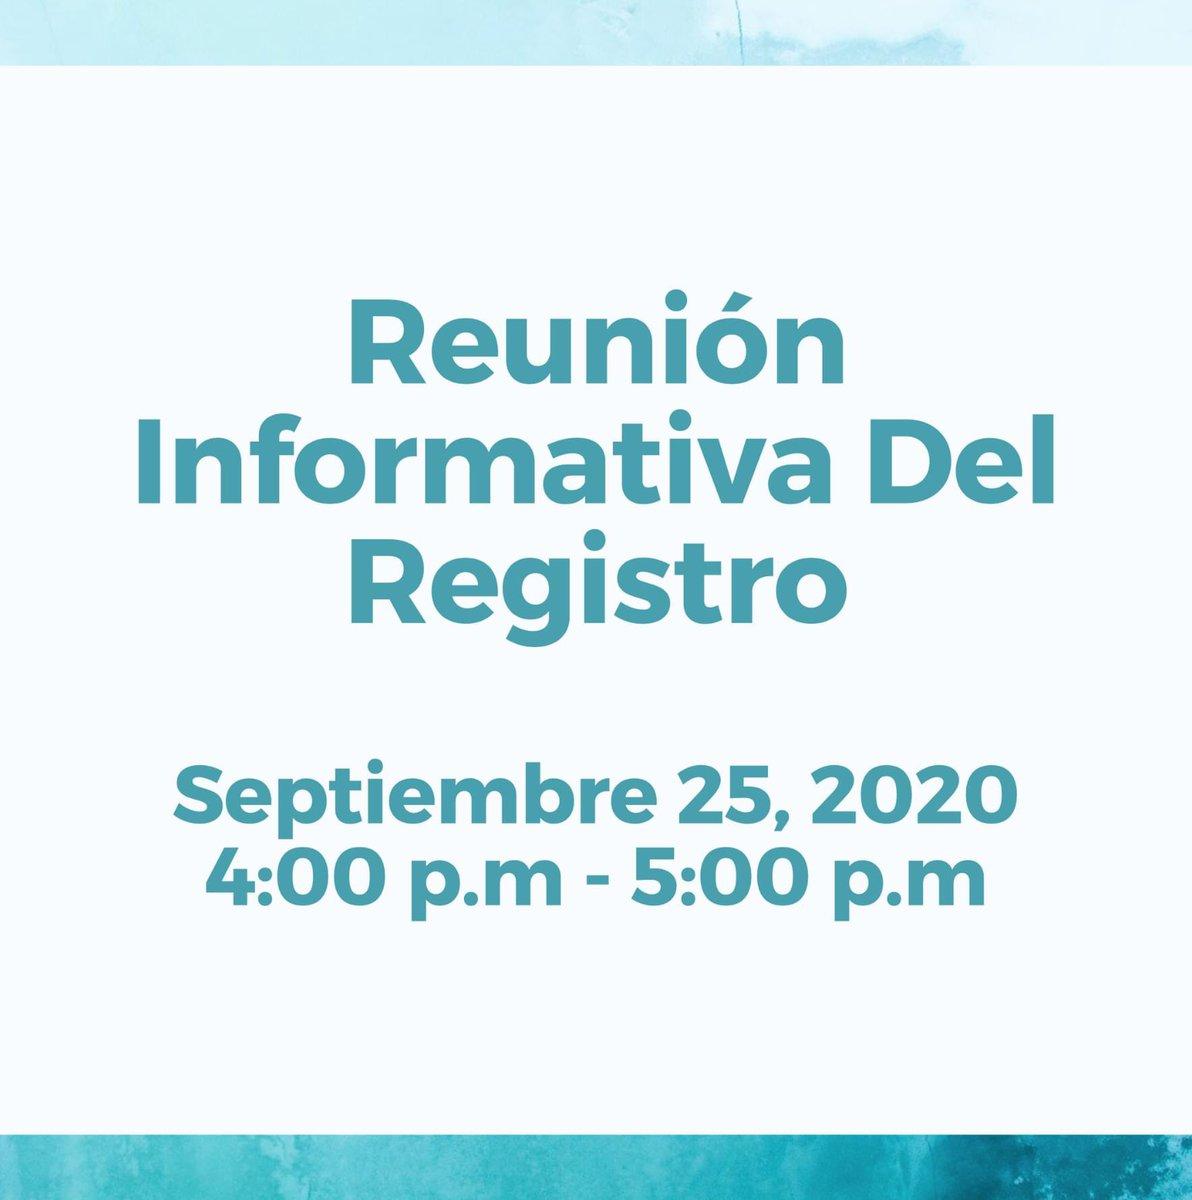 Estamos buscando proveedores de IHSS. Únete a la reunión con Zoom. Esta reunión será en español. Si está interesado, regístrese hoy en el siguiente enlace https://t.co/UU5V7V4LQ6.  #pasc #pascla #ihss #consumers #providers #losangeles #LACounty https://t.co/nWlr0V7wXy